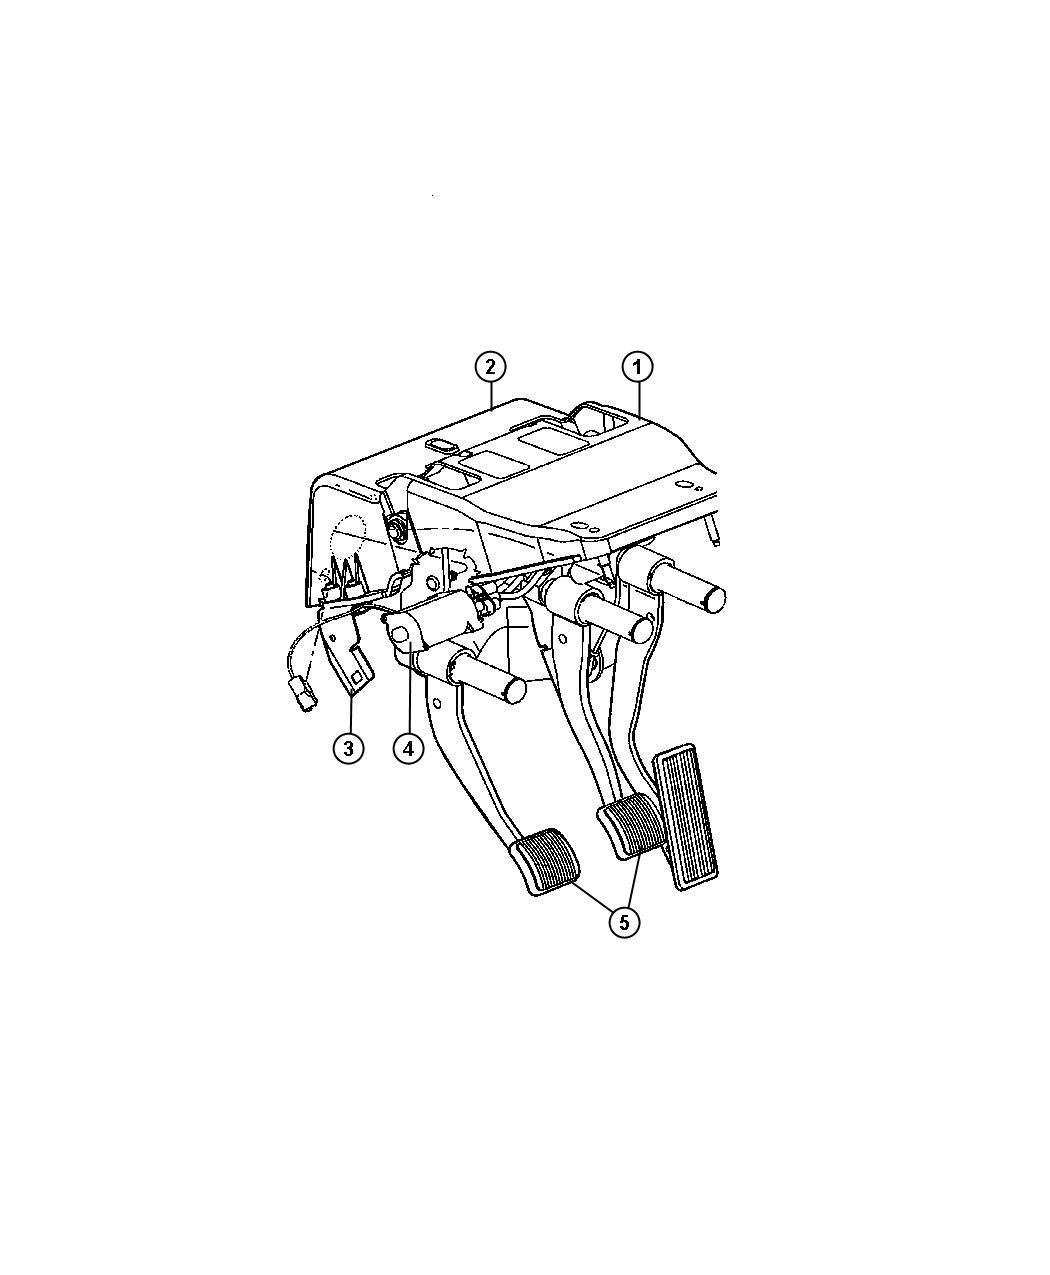 Dodge Ram 1500 Used for: PEDAL AND BRACKET. BRAKE